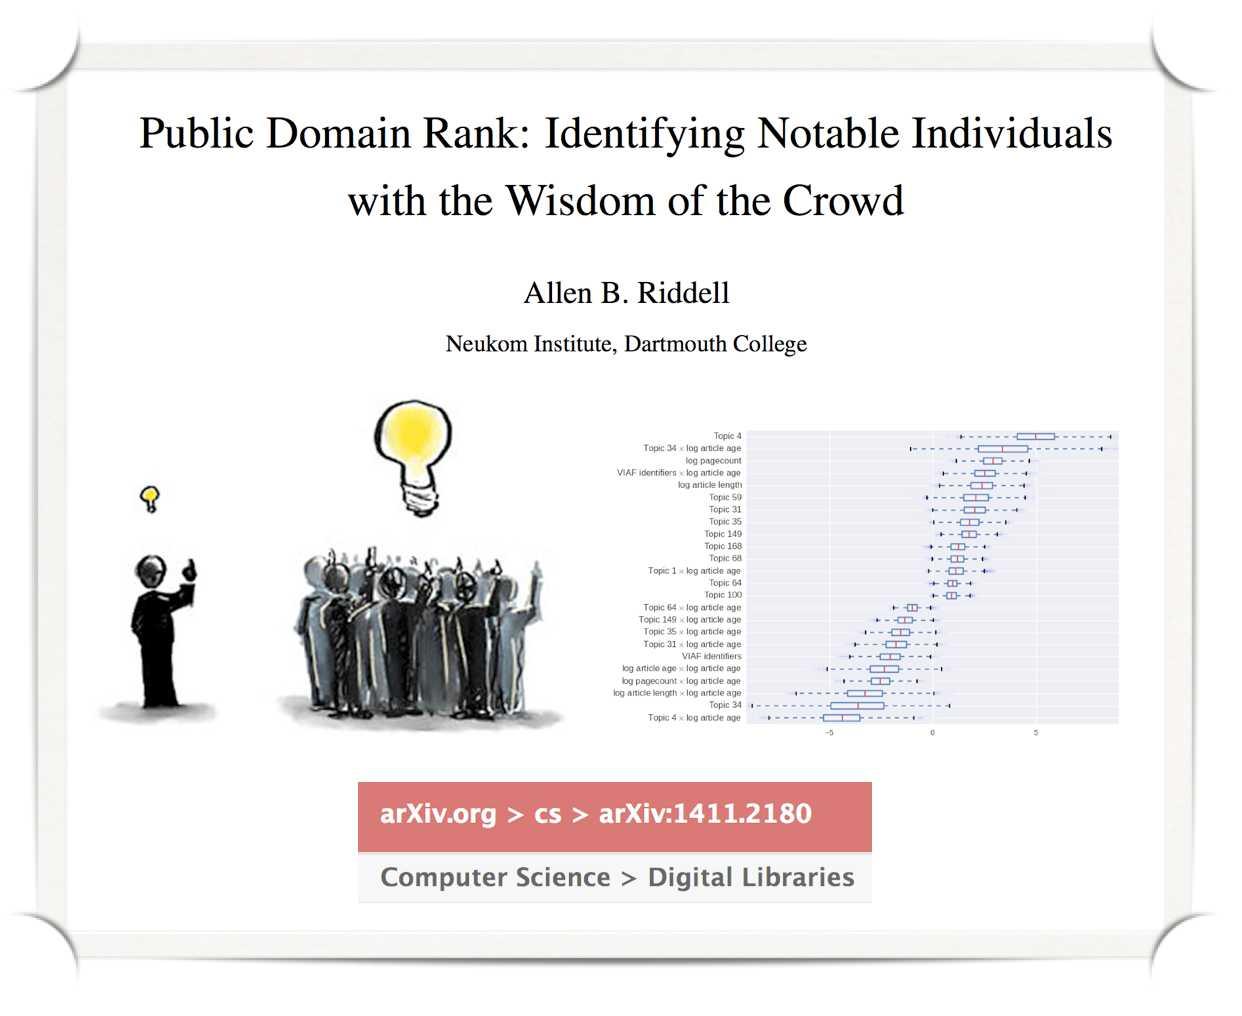 Public Domain Rank